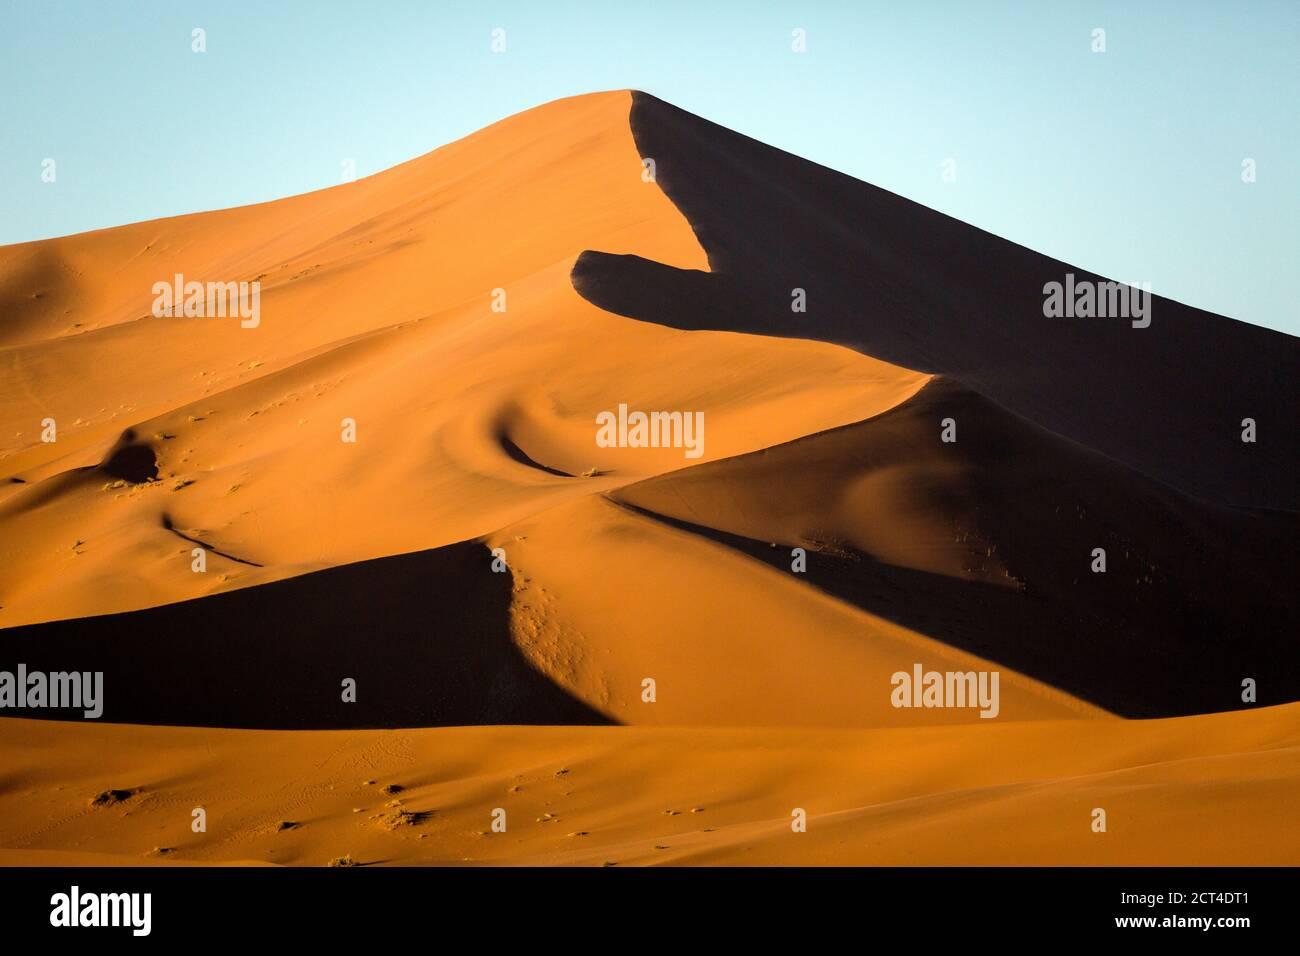 Dunas de arena roja bajo la luz de la mañana en Sossusvlei, Namibia. Foto de stock